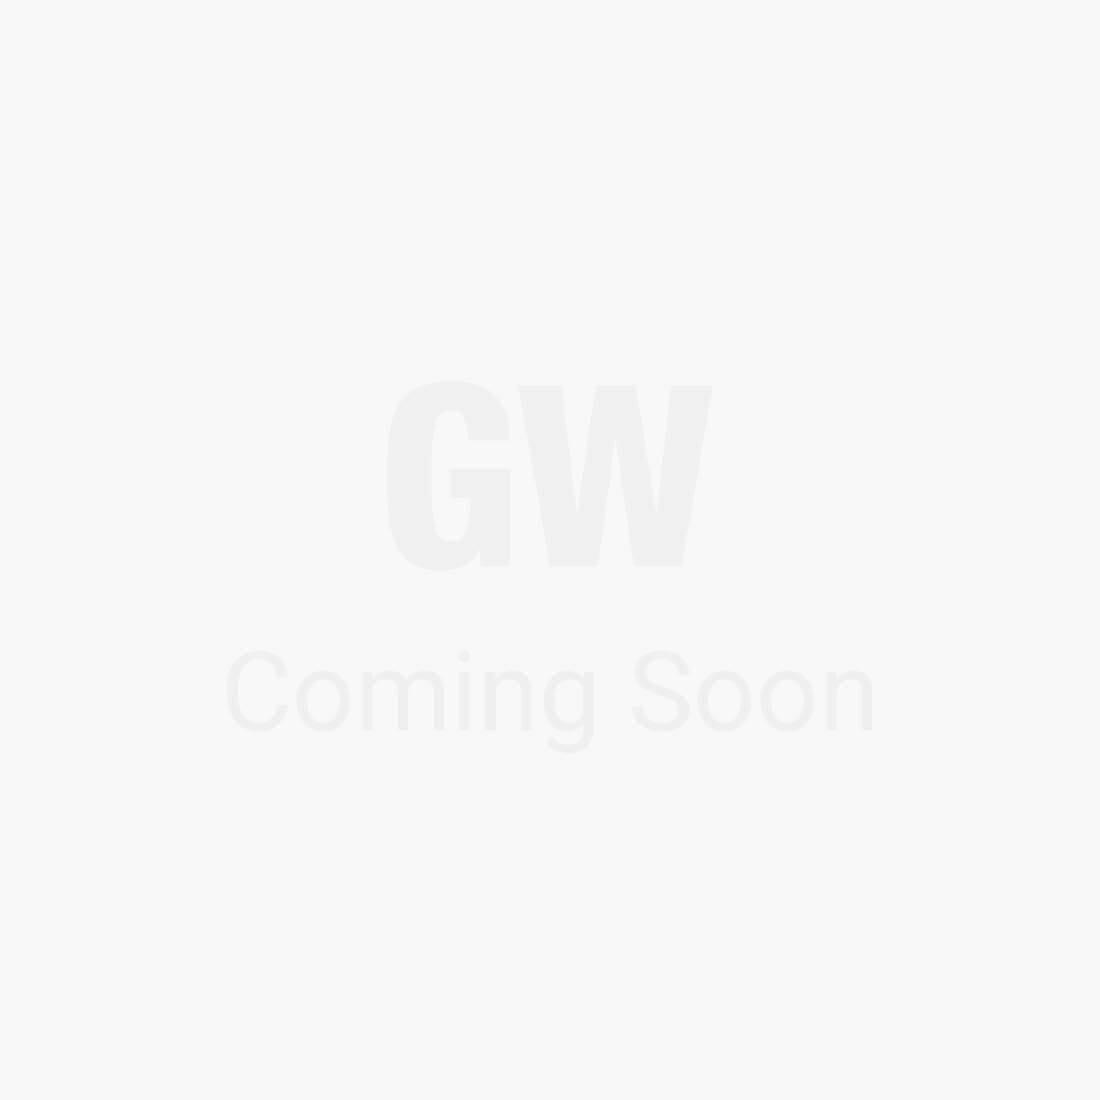 Hamilton 1 Seater Sofa